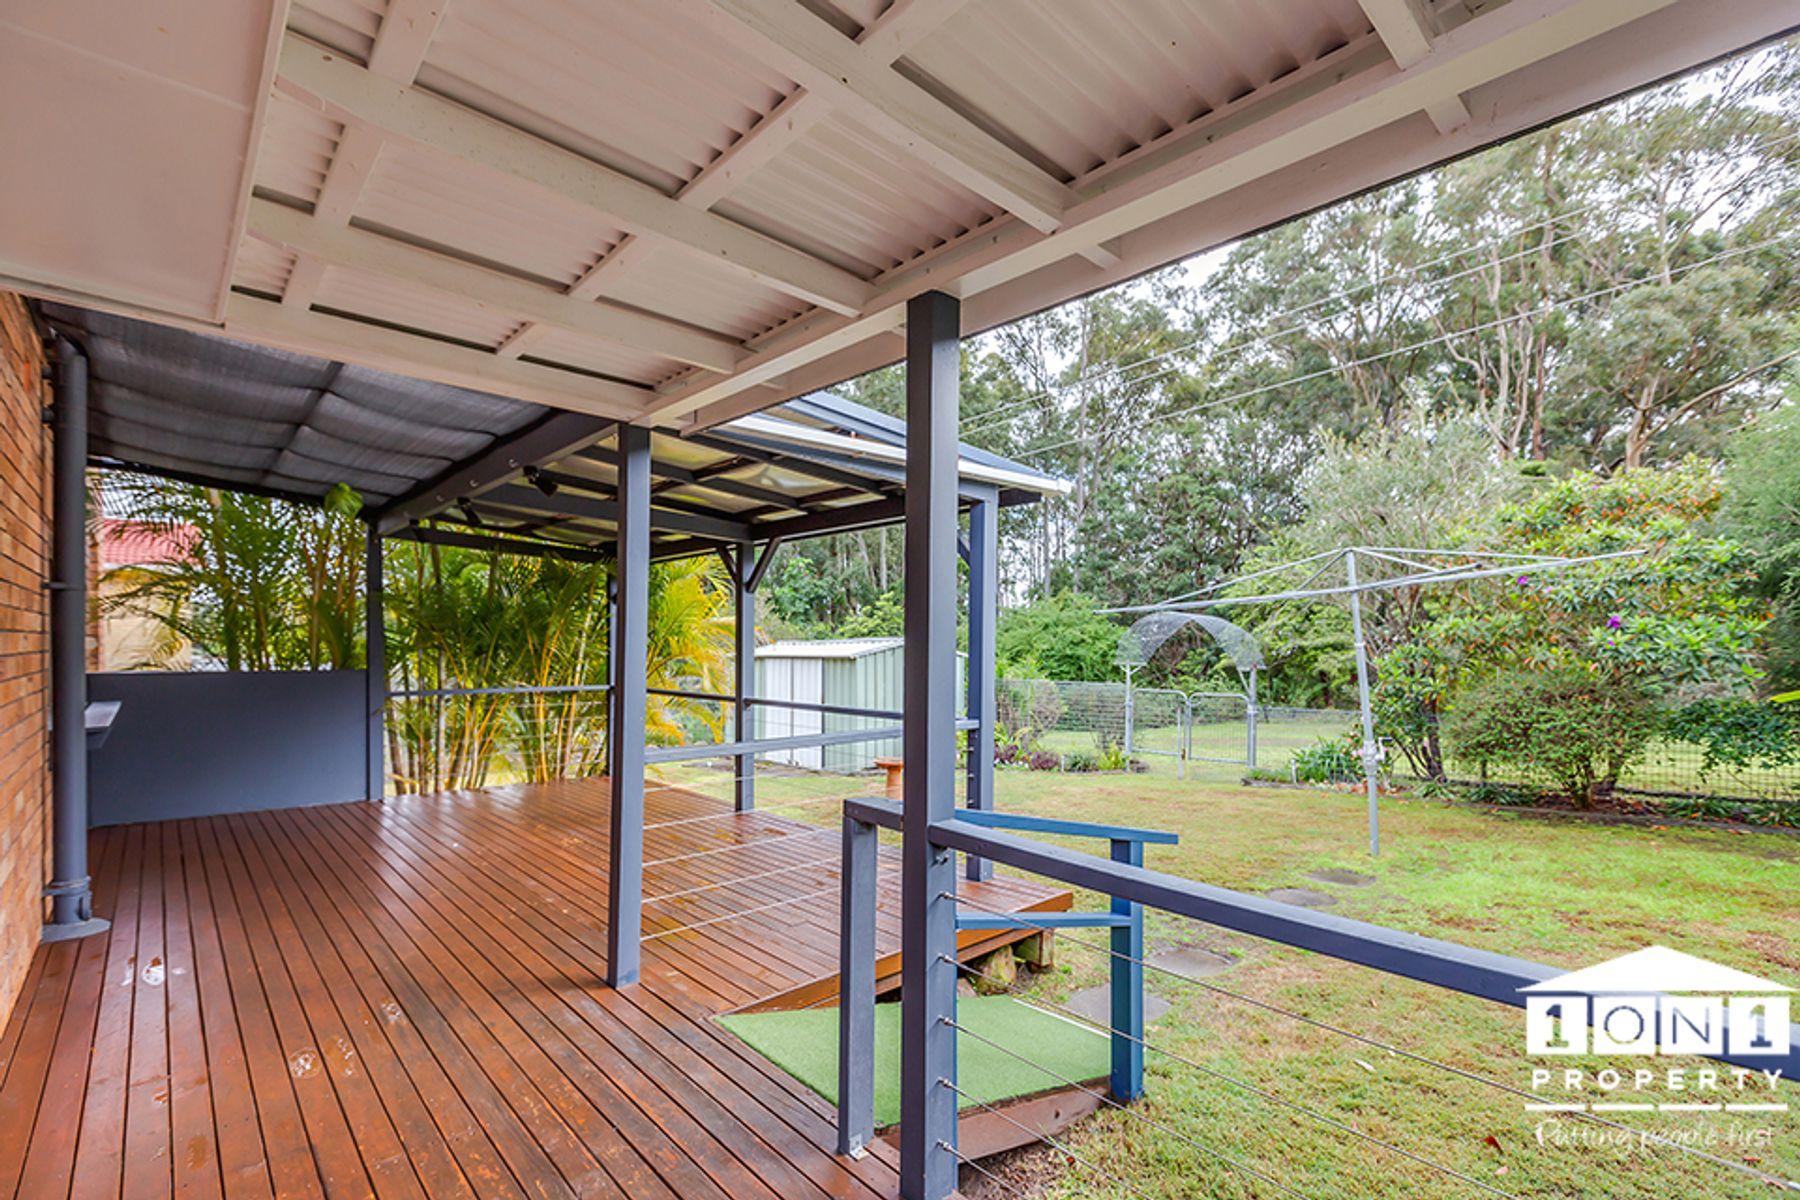 1on1 Property :: 23 Regal Way, Valentine, NSW 2280